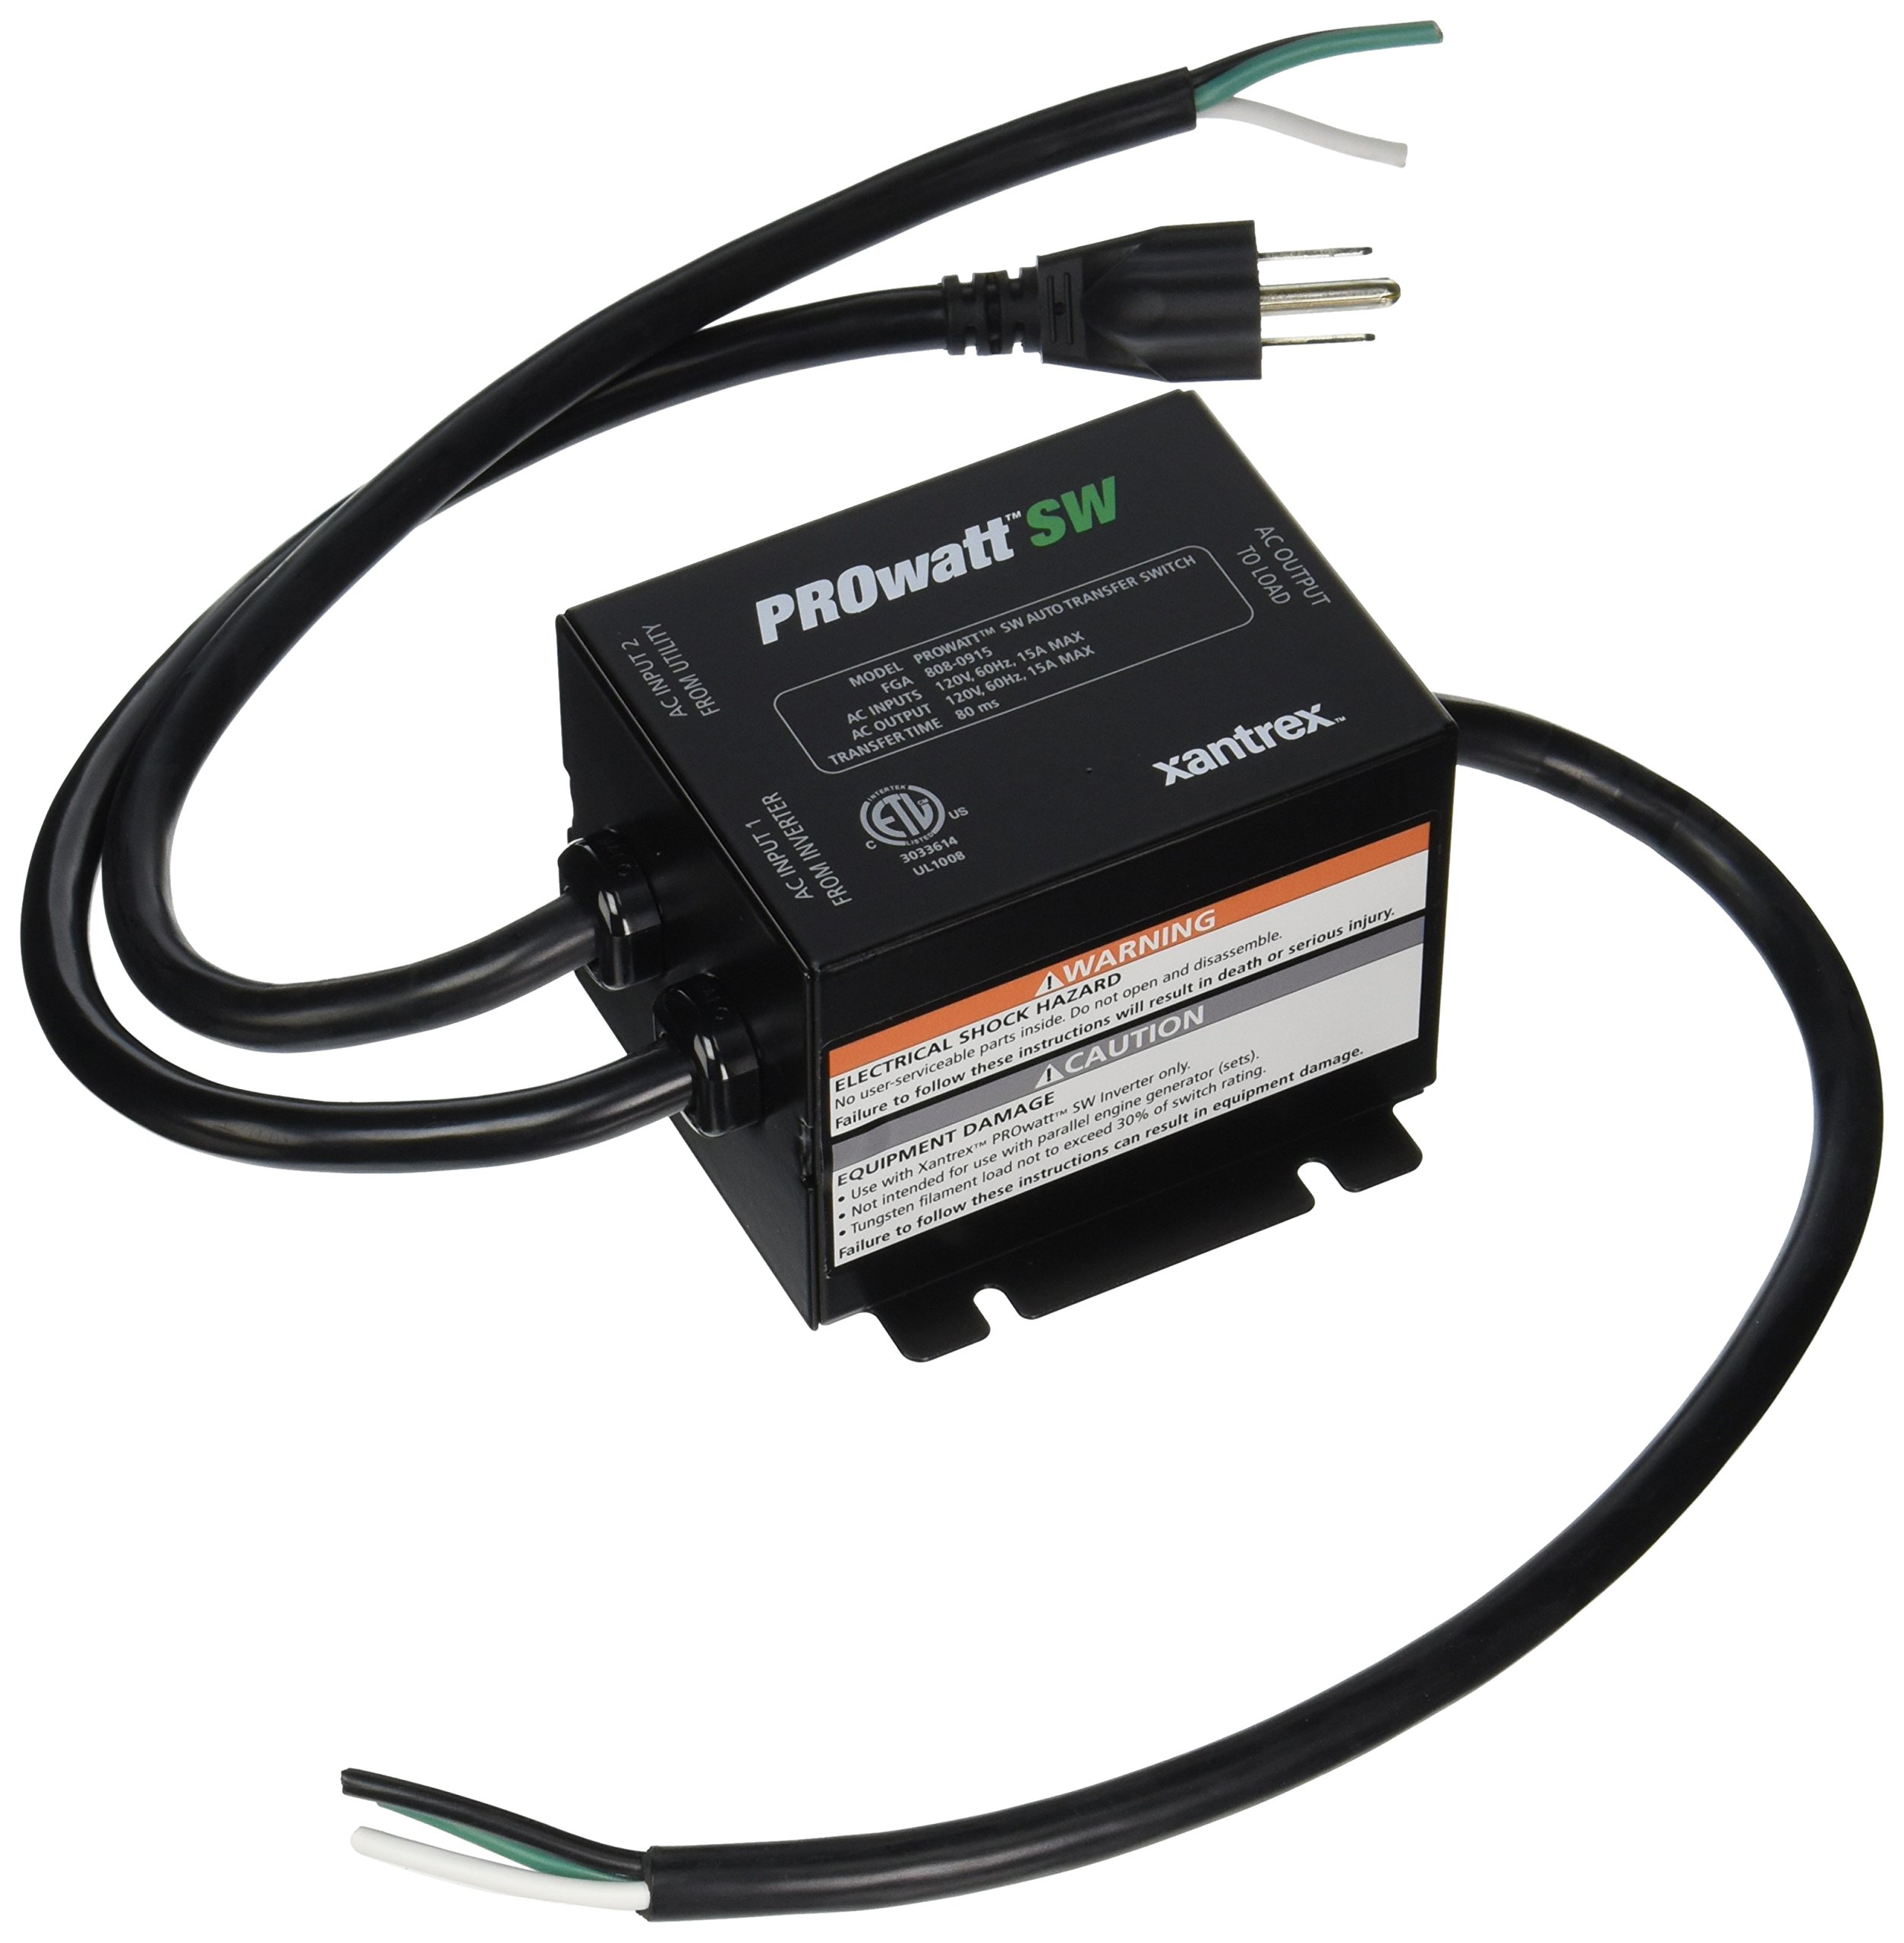 Xantrex 8080915 PROwatt Transfer Switch